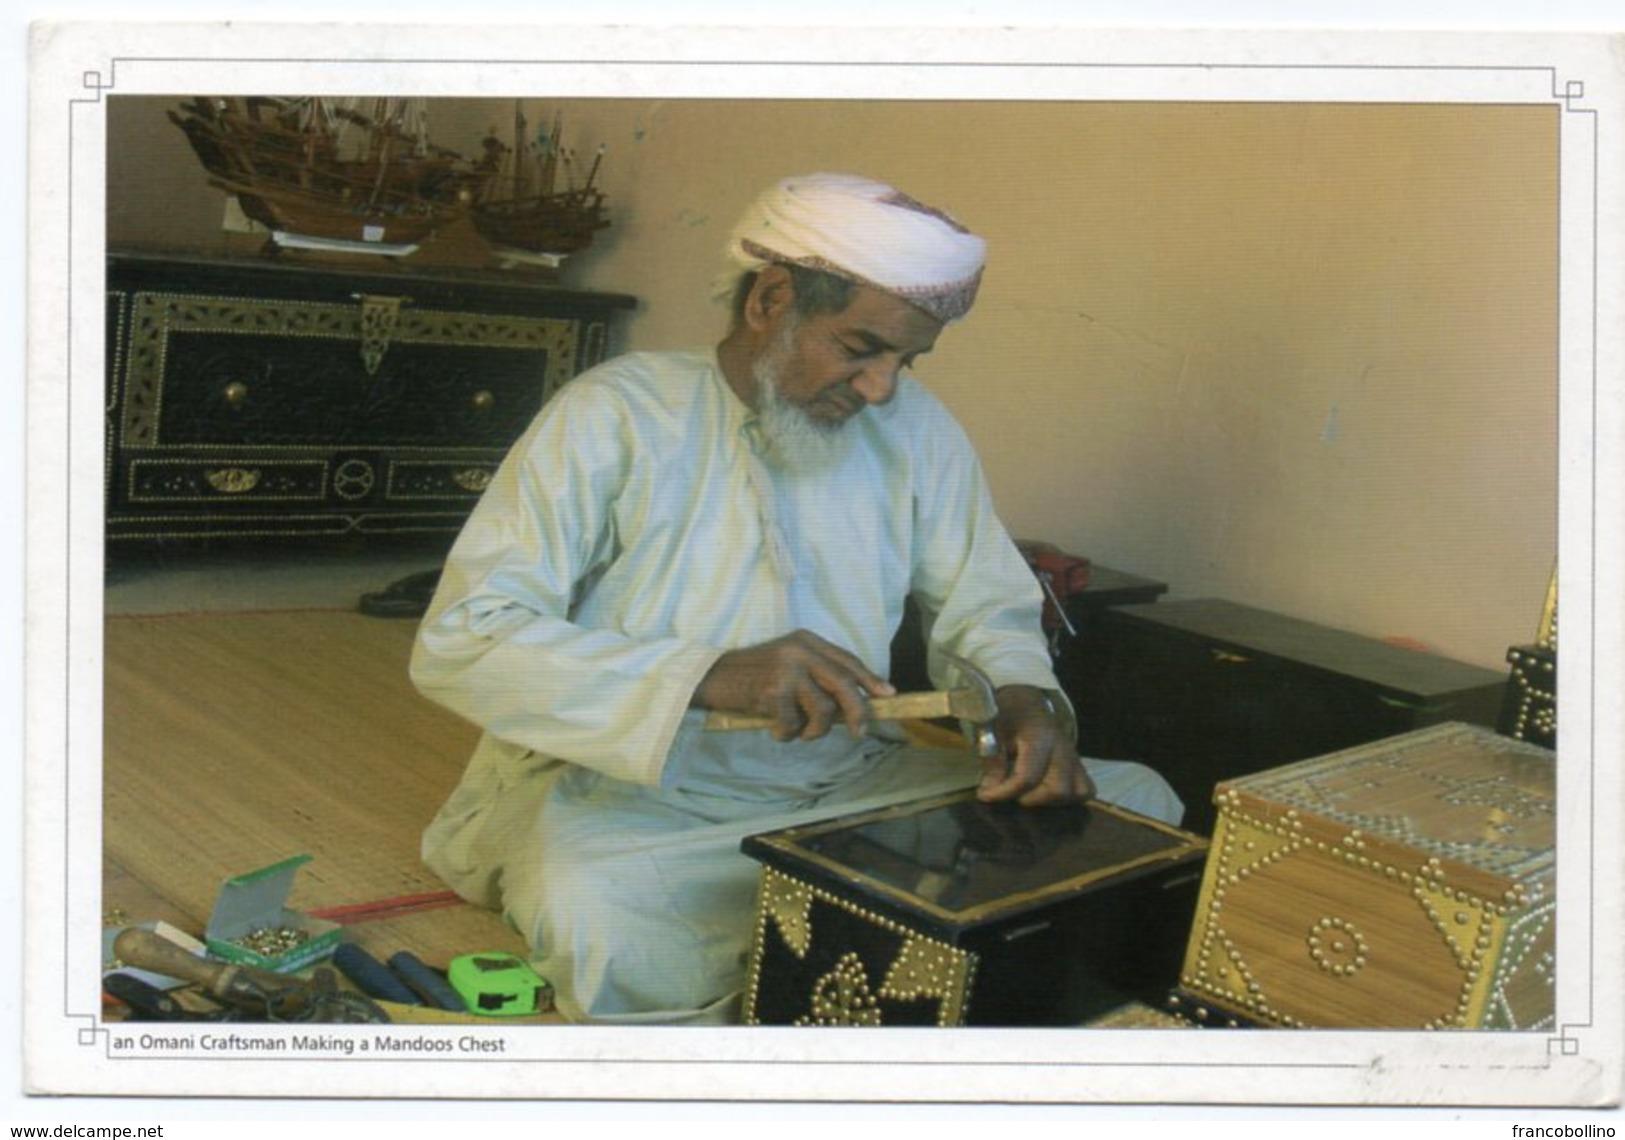 OMAN - AN OMANI CRAFTSMAN MAKING A MANDOOS CHEST - Oman